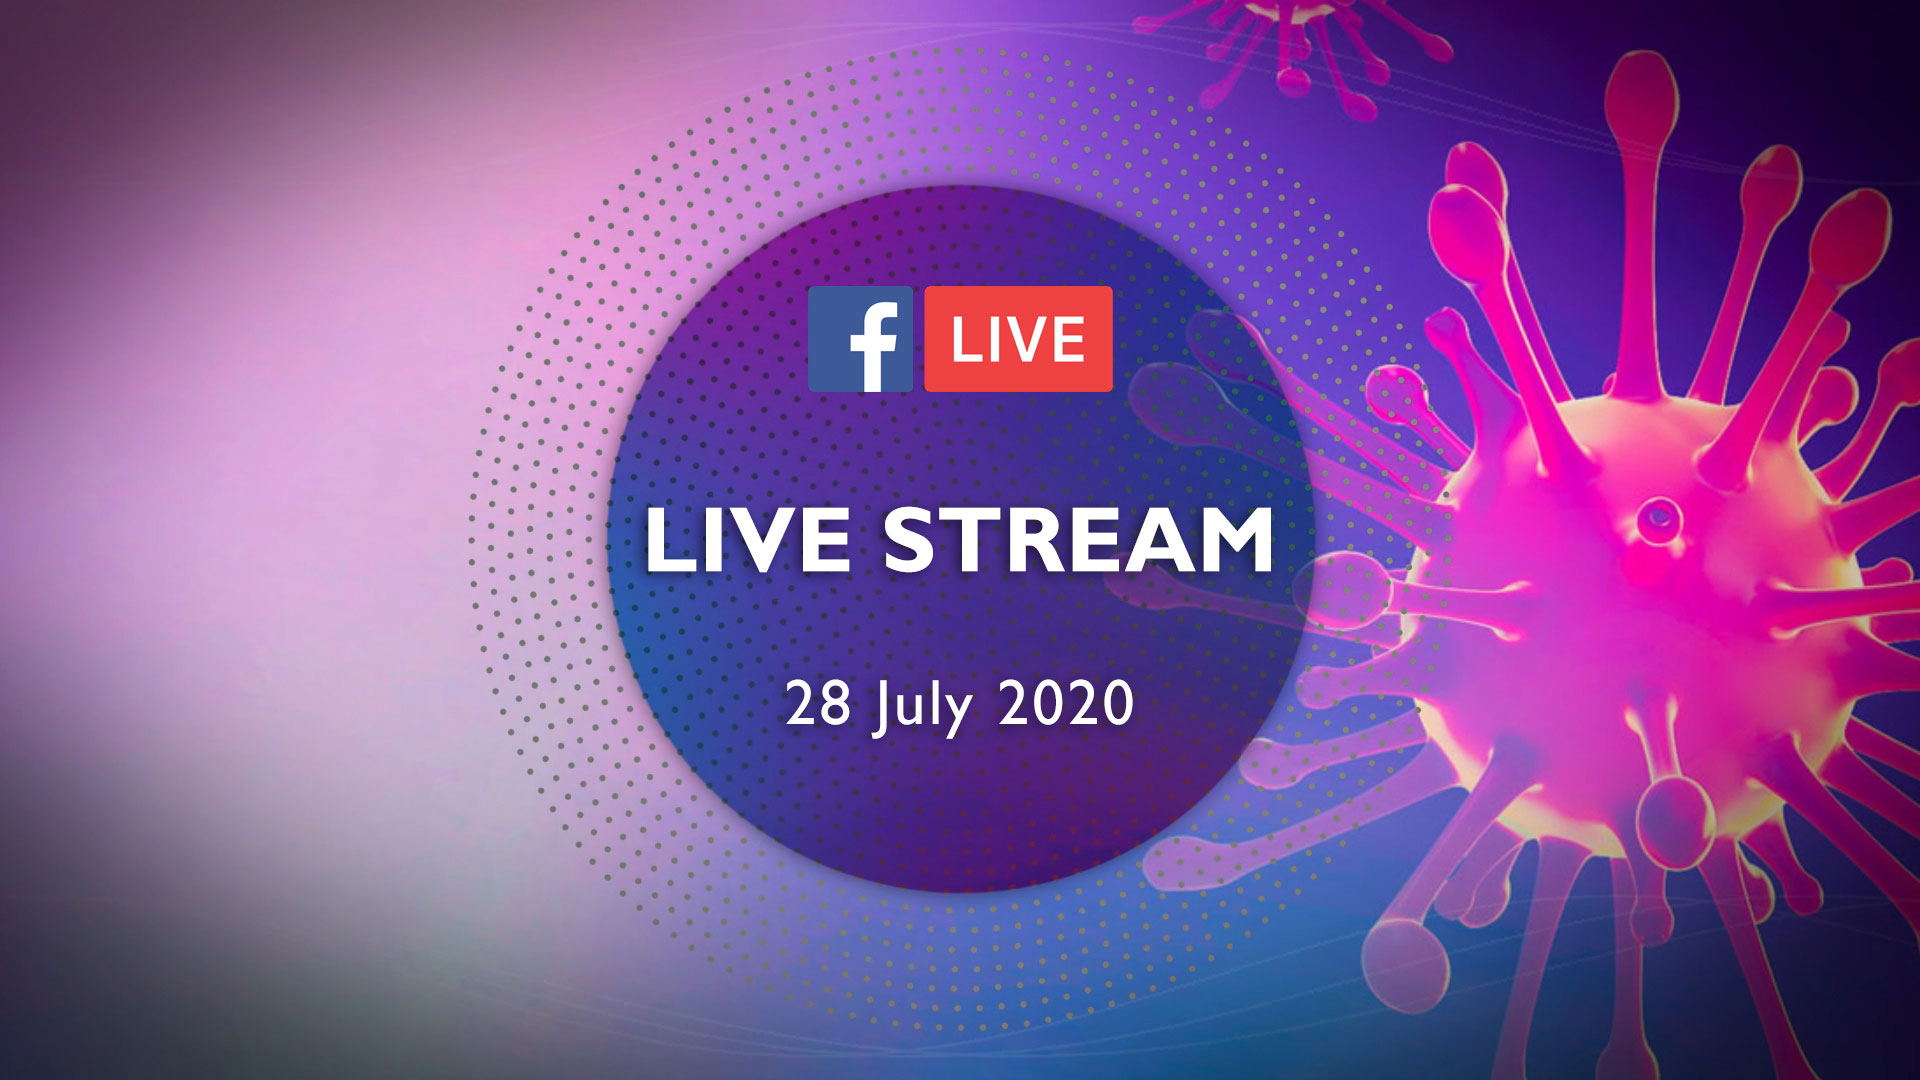 CV-Live-Stream-28th-July-2020-Featl